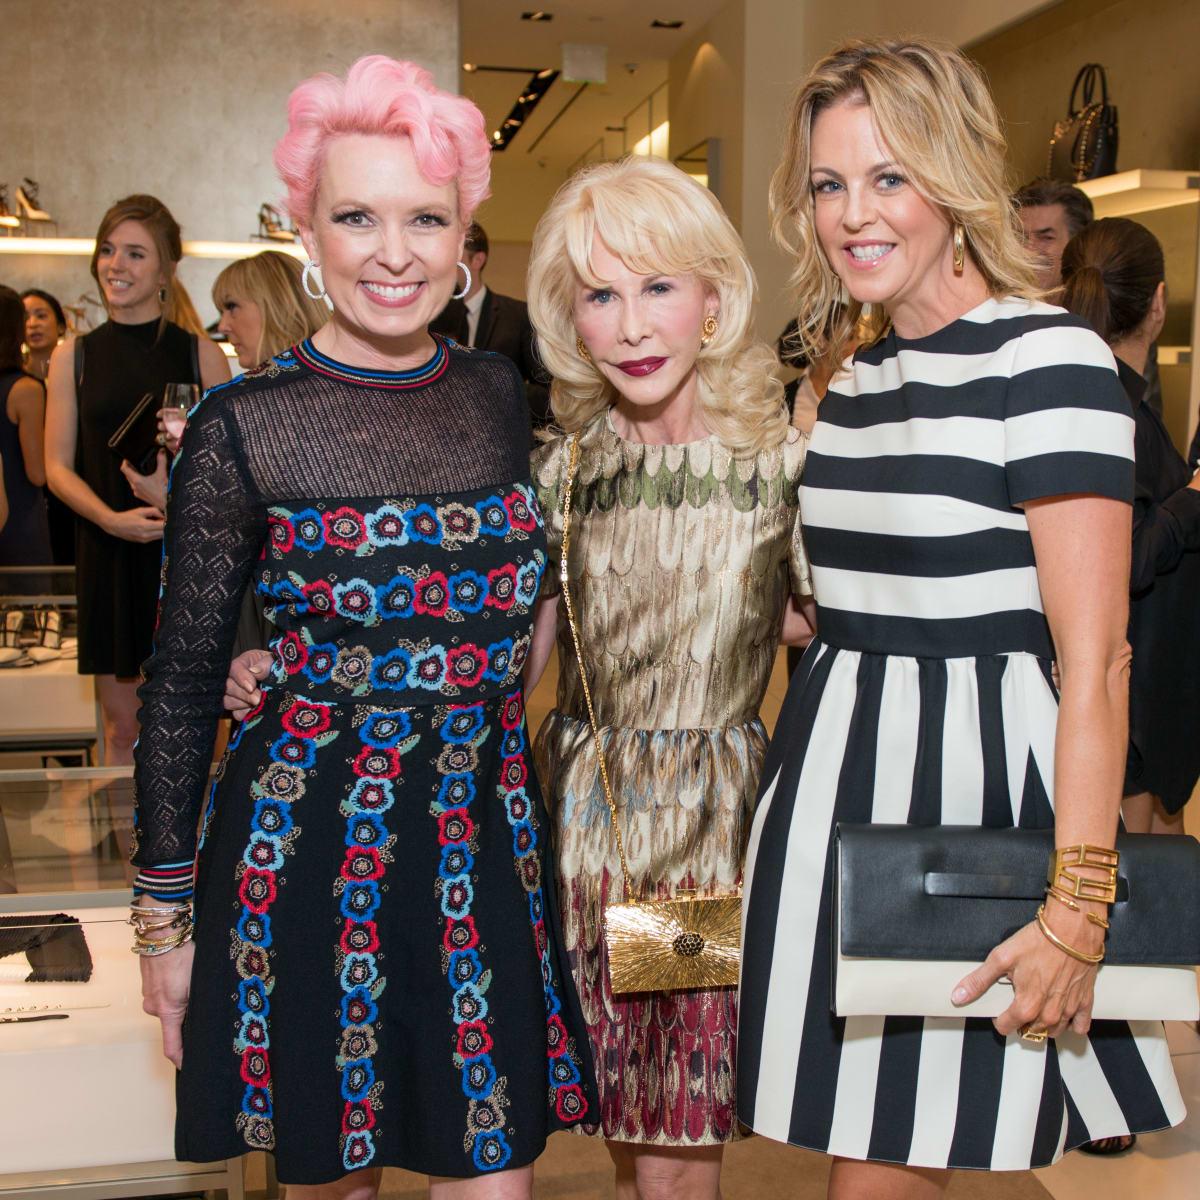 News, Shelby, Heart of Fashion, Valentino, Sept. 2015, Vivian Wise, Diane Lokey Farb, Elizabeth Petersen